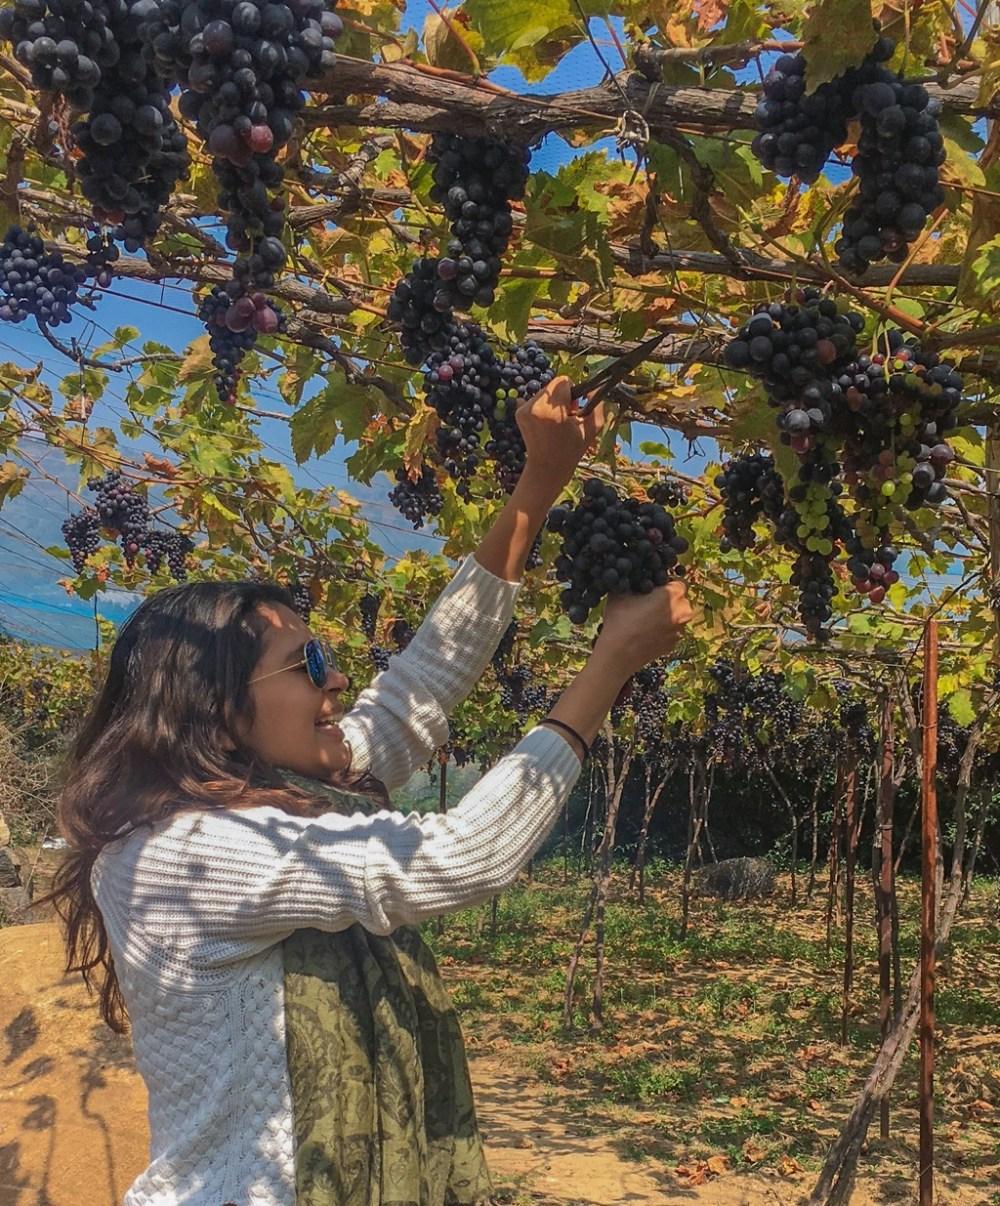 Plucking grapes in the vineyards in Nilgiris